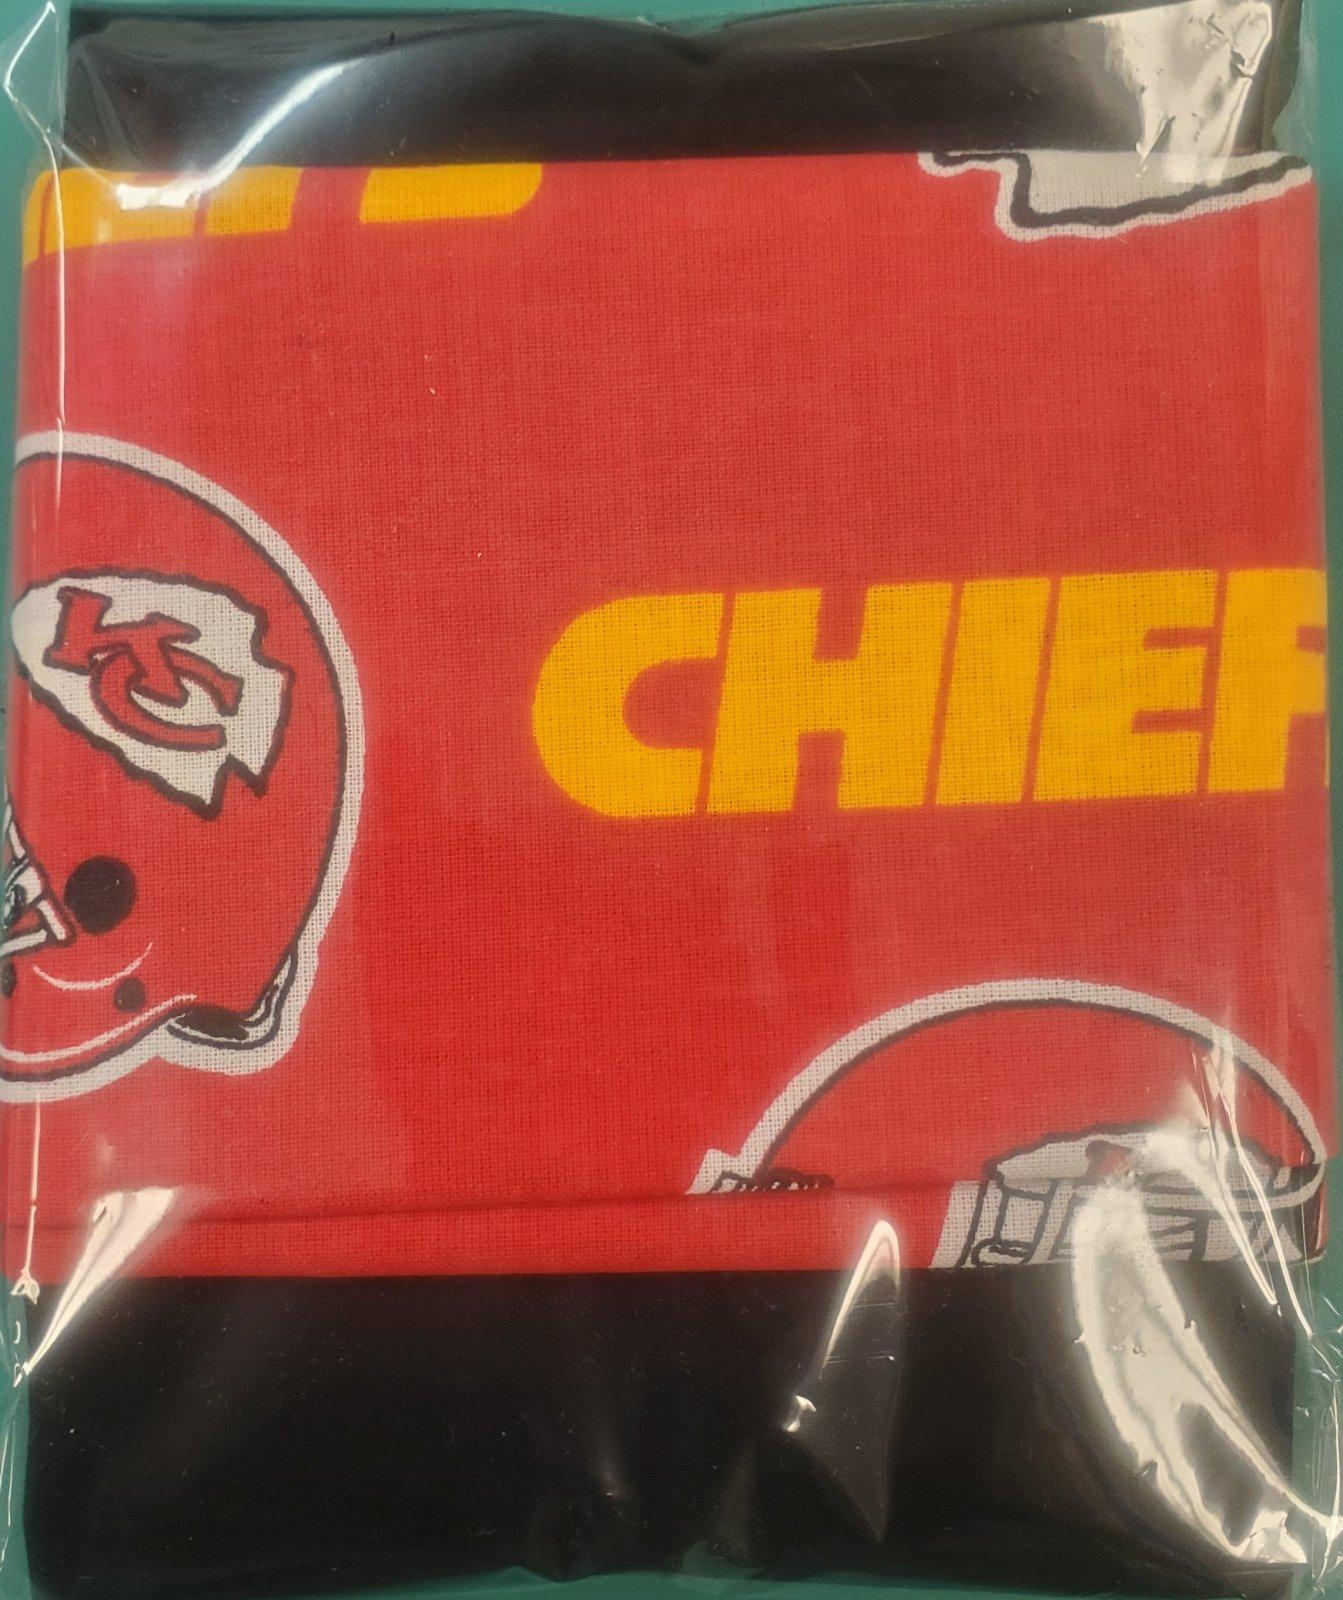 Chiefs Bowl Cozy Fabric Kit (Makes 4 Bowls)